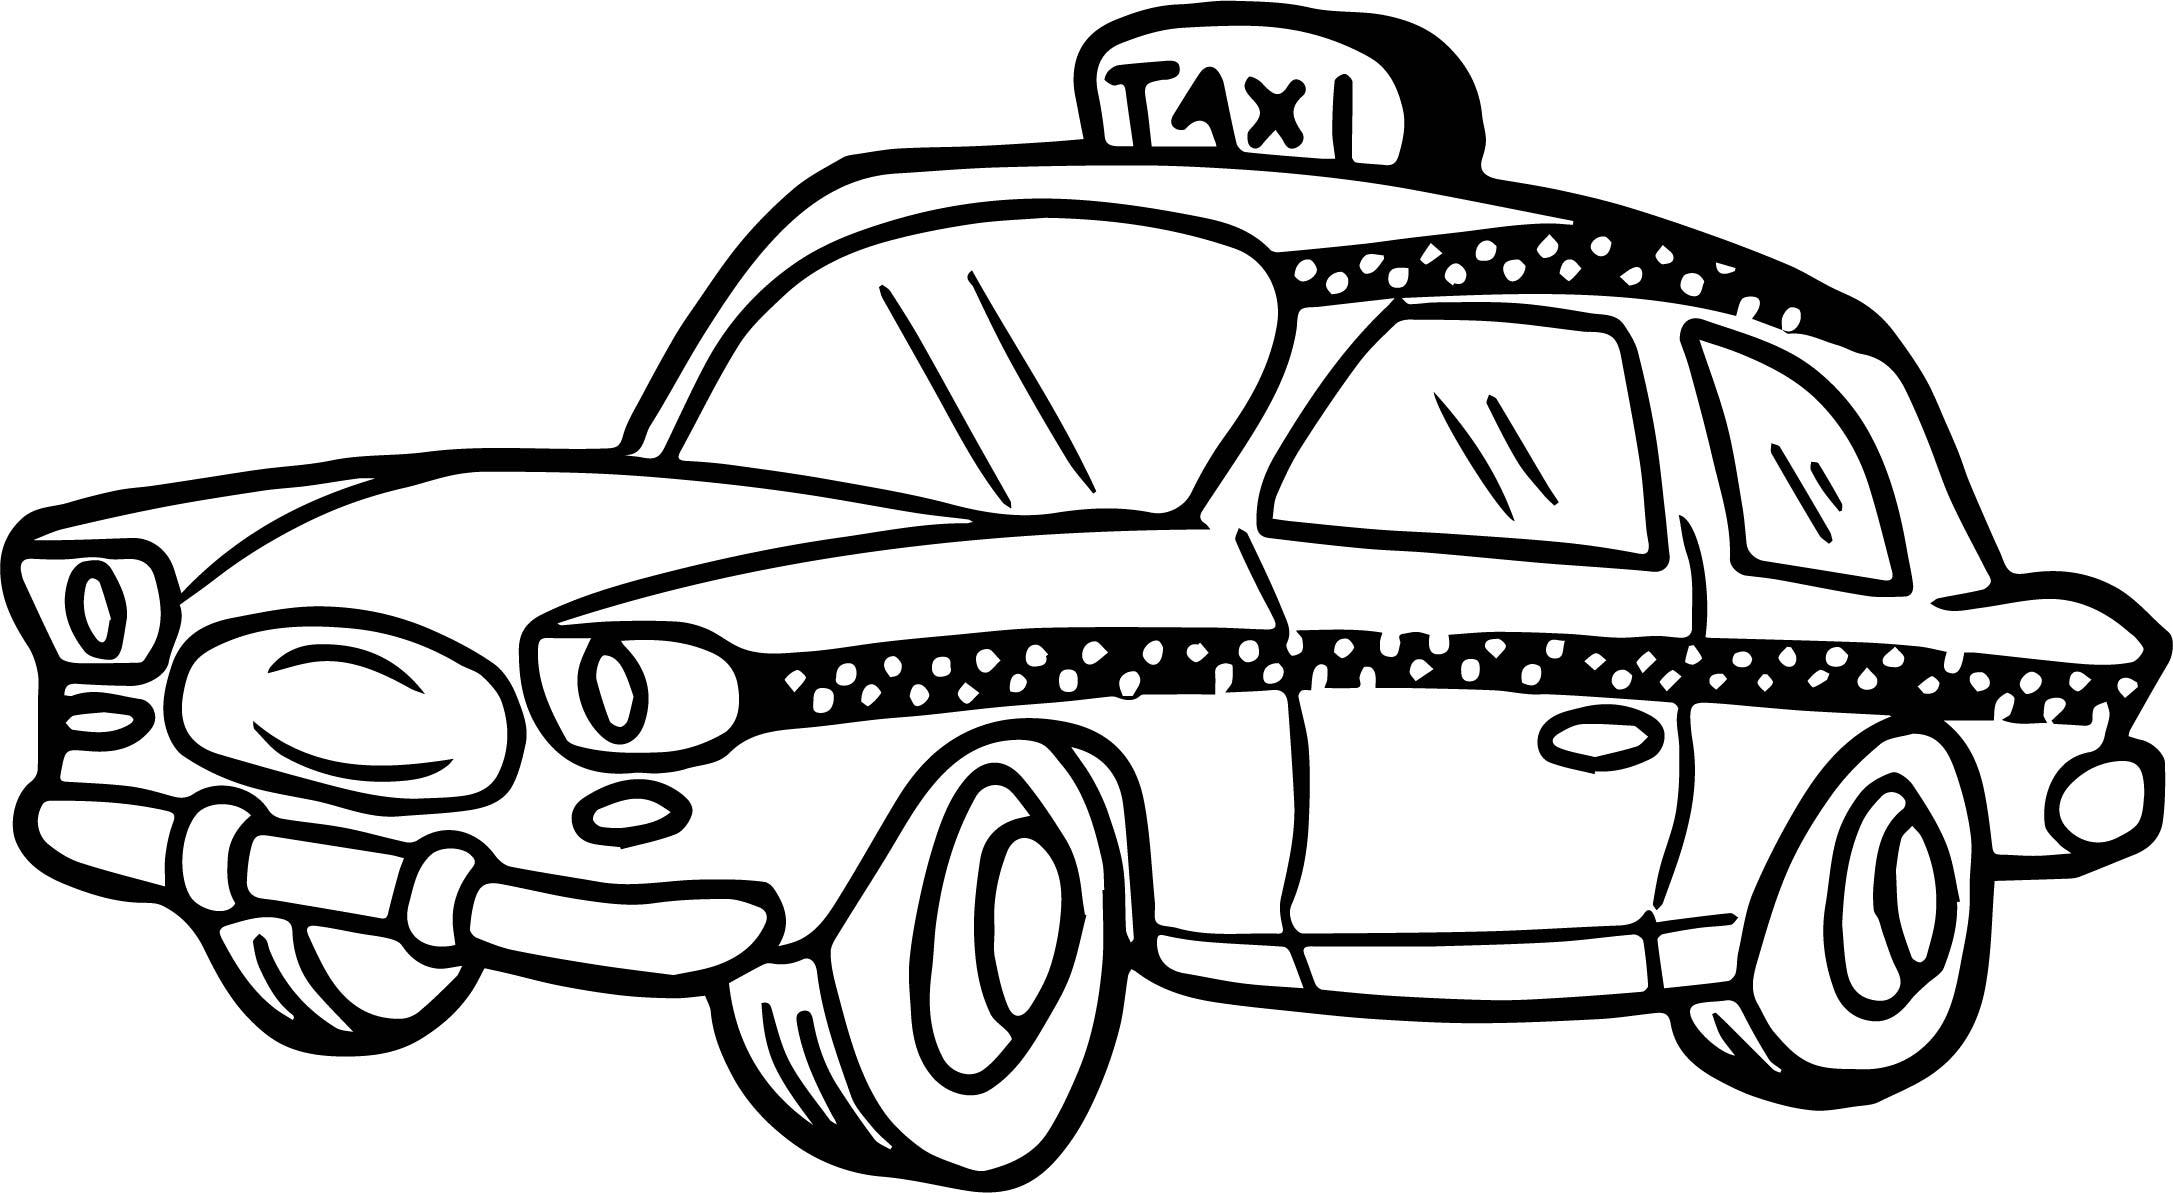 Taxi black and white clipart clip art black and white Cab clipart black and white 3 » Clipart Station clip art black and white